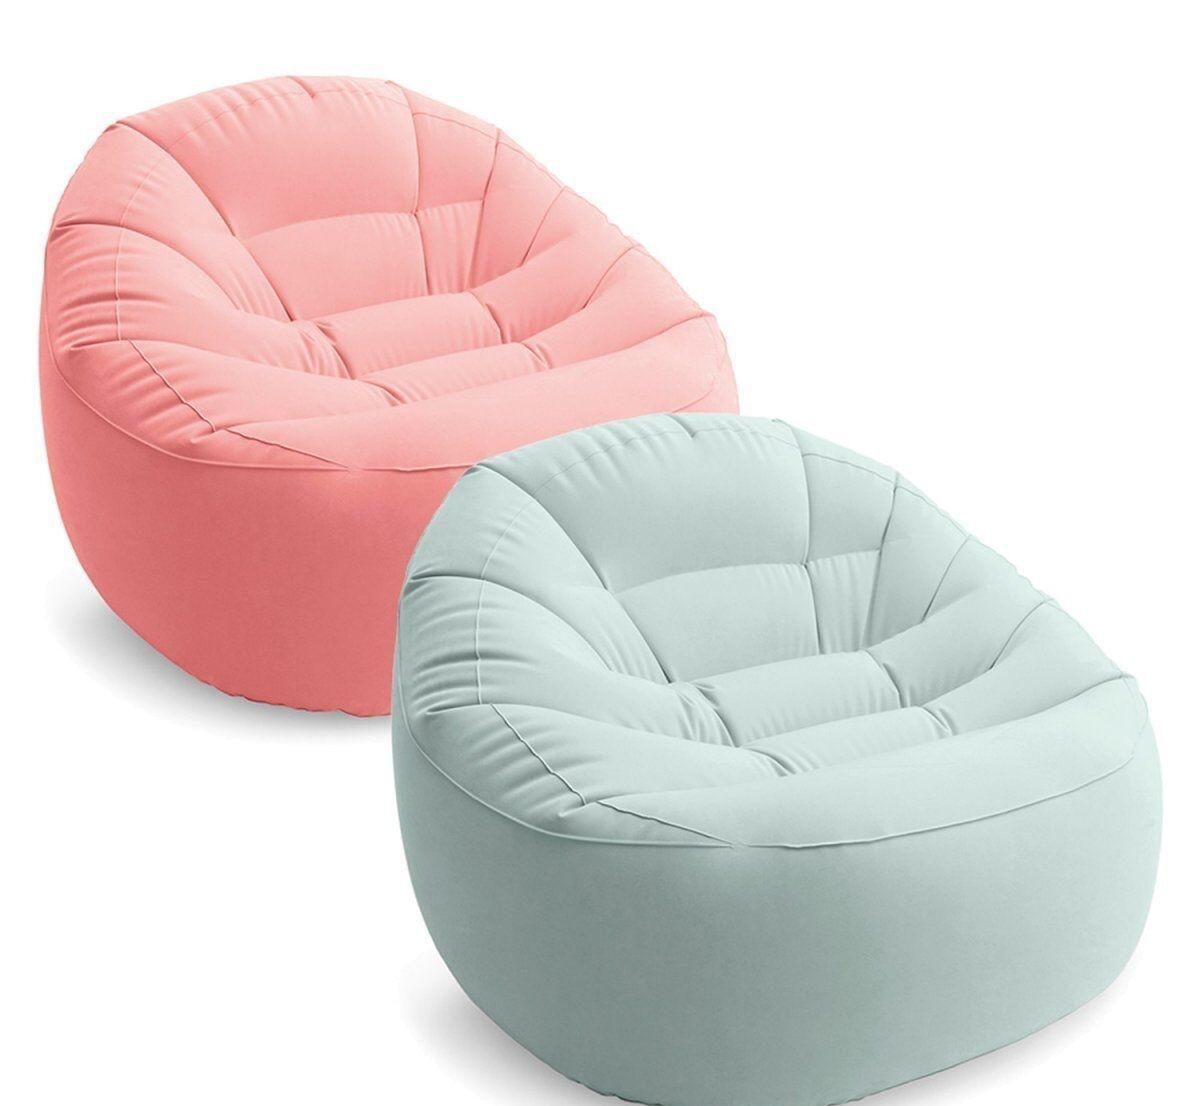 Надувное кресло Intex  68590 NP 2 цвета, 112 х 104 х 74 см